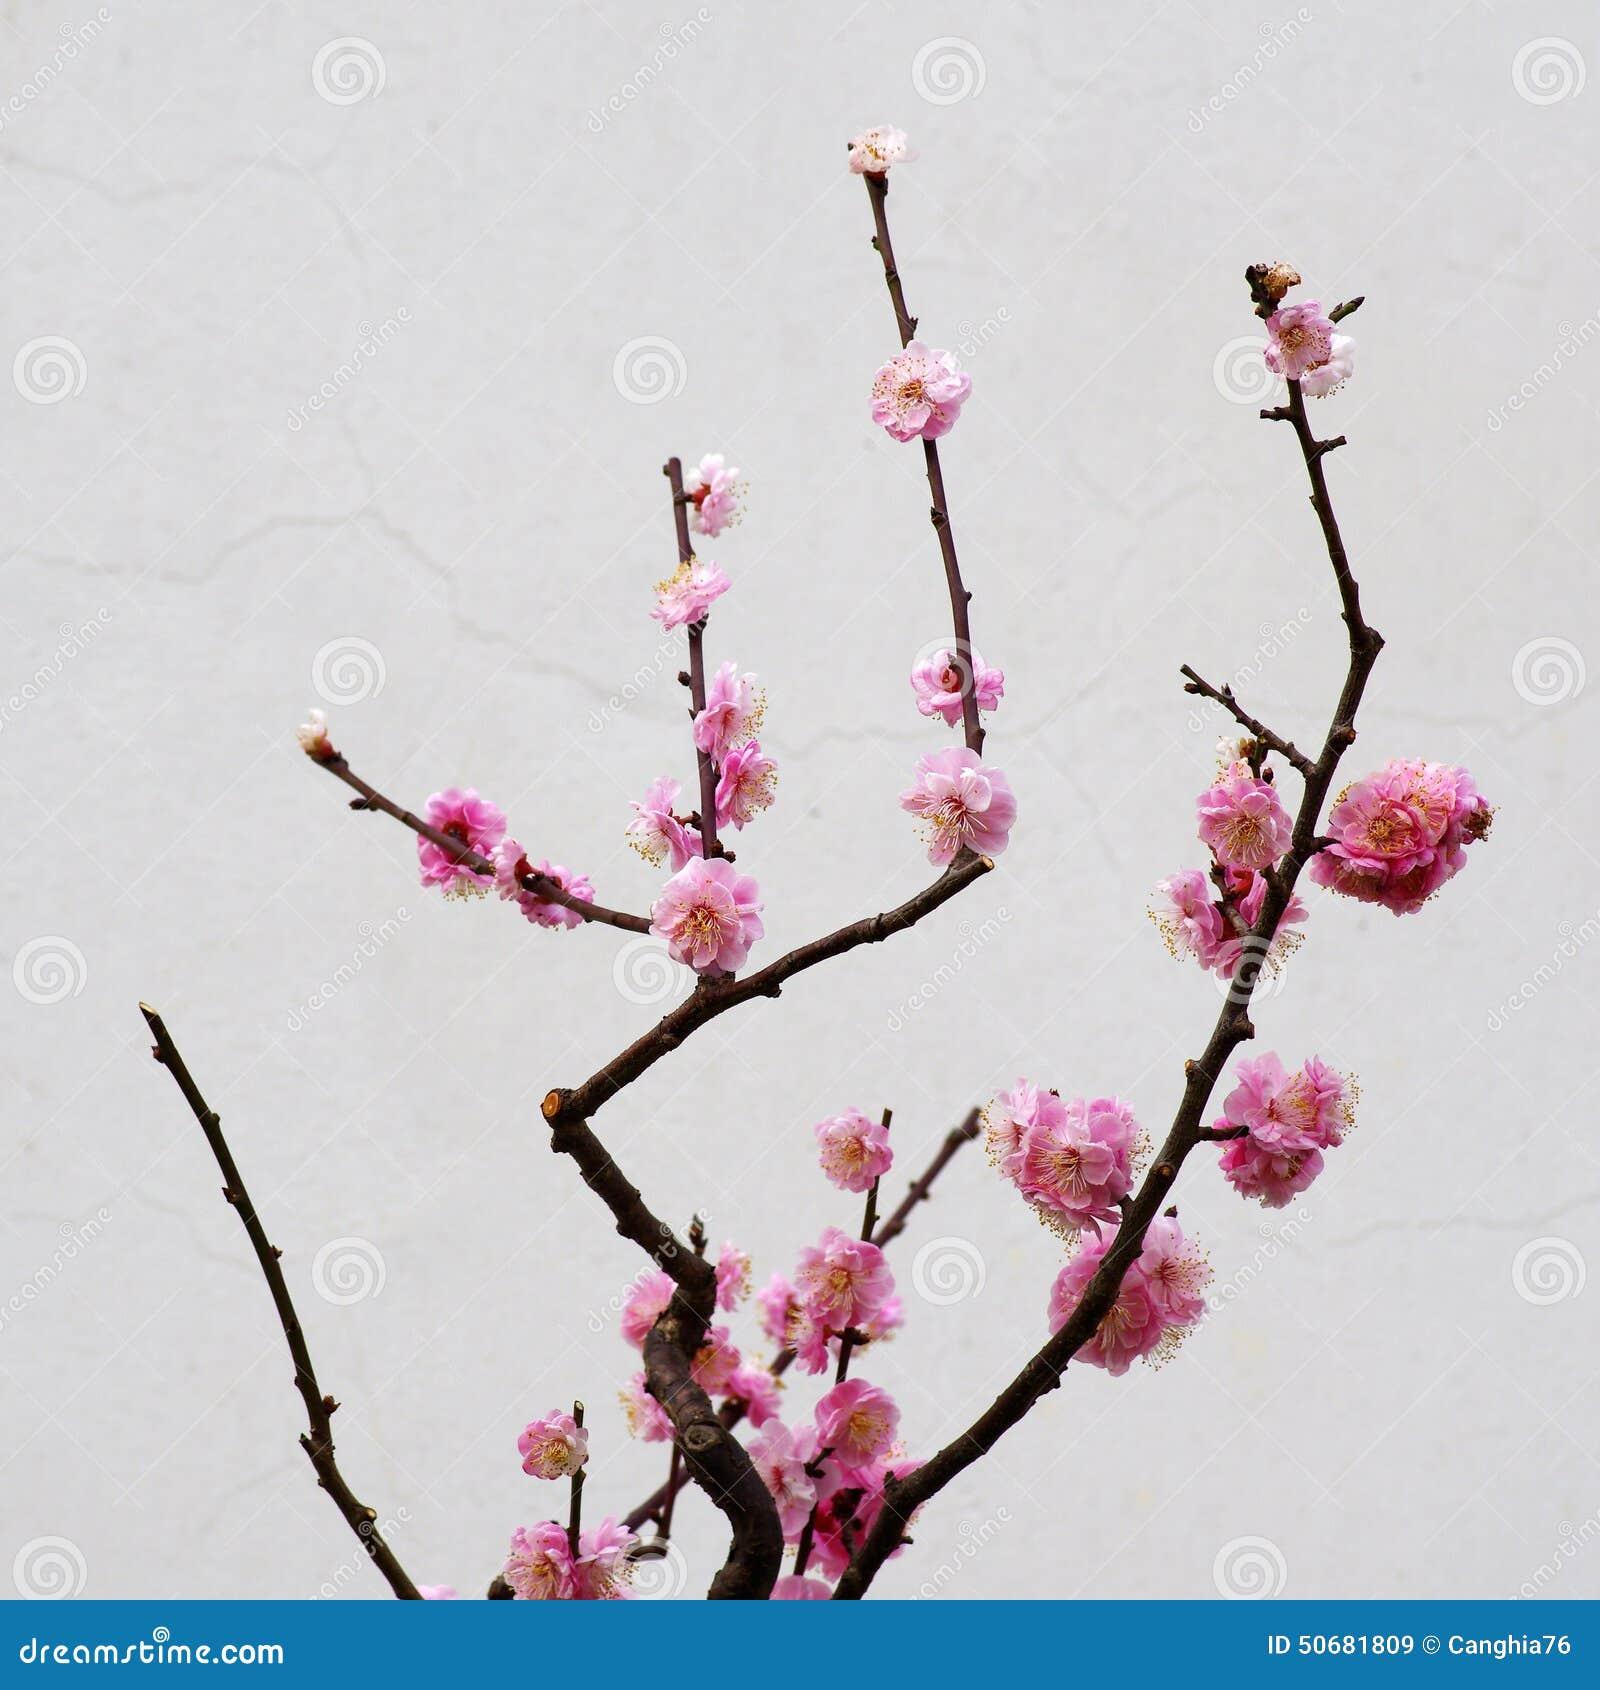 Download 李子花开花 库存图片. 图片 包括有 空白, 粉红色, 芬芳, 水平, 五颜六色, 新鲜, 开花, brander - 50681809